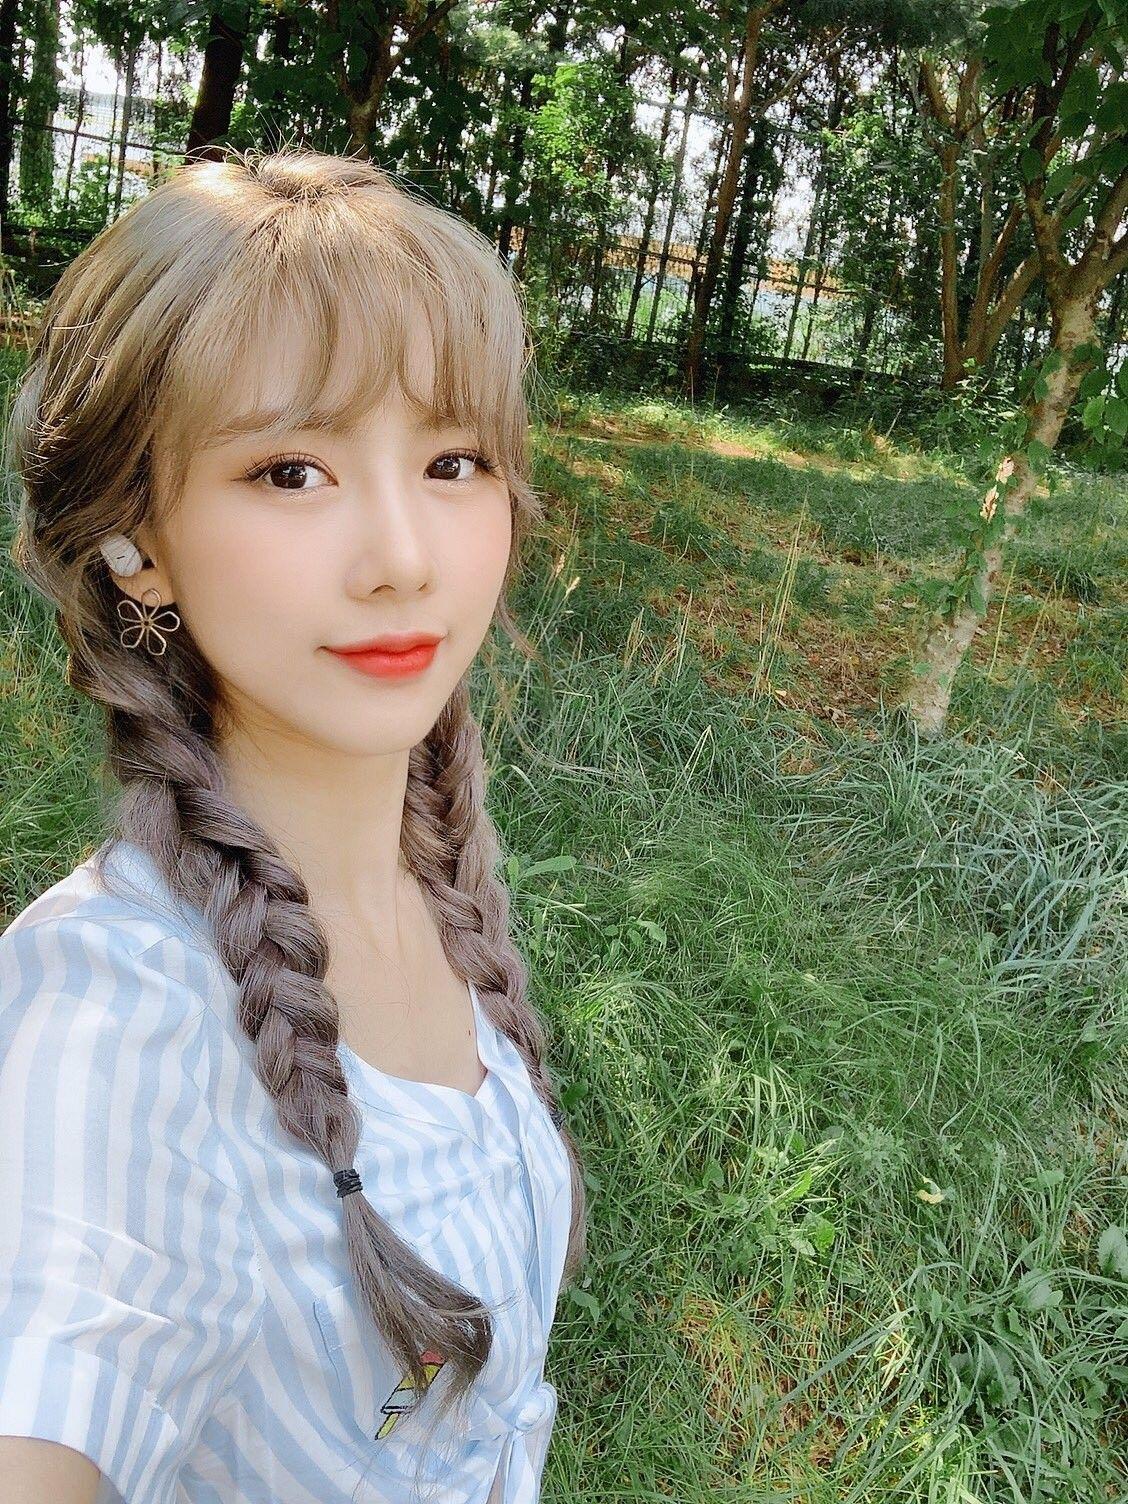 Yoohyeon S 2002 Cover Dream Catcher Kpop Girl Groups Kpop Girls